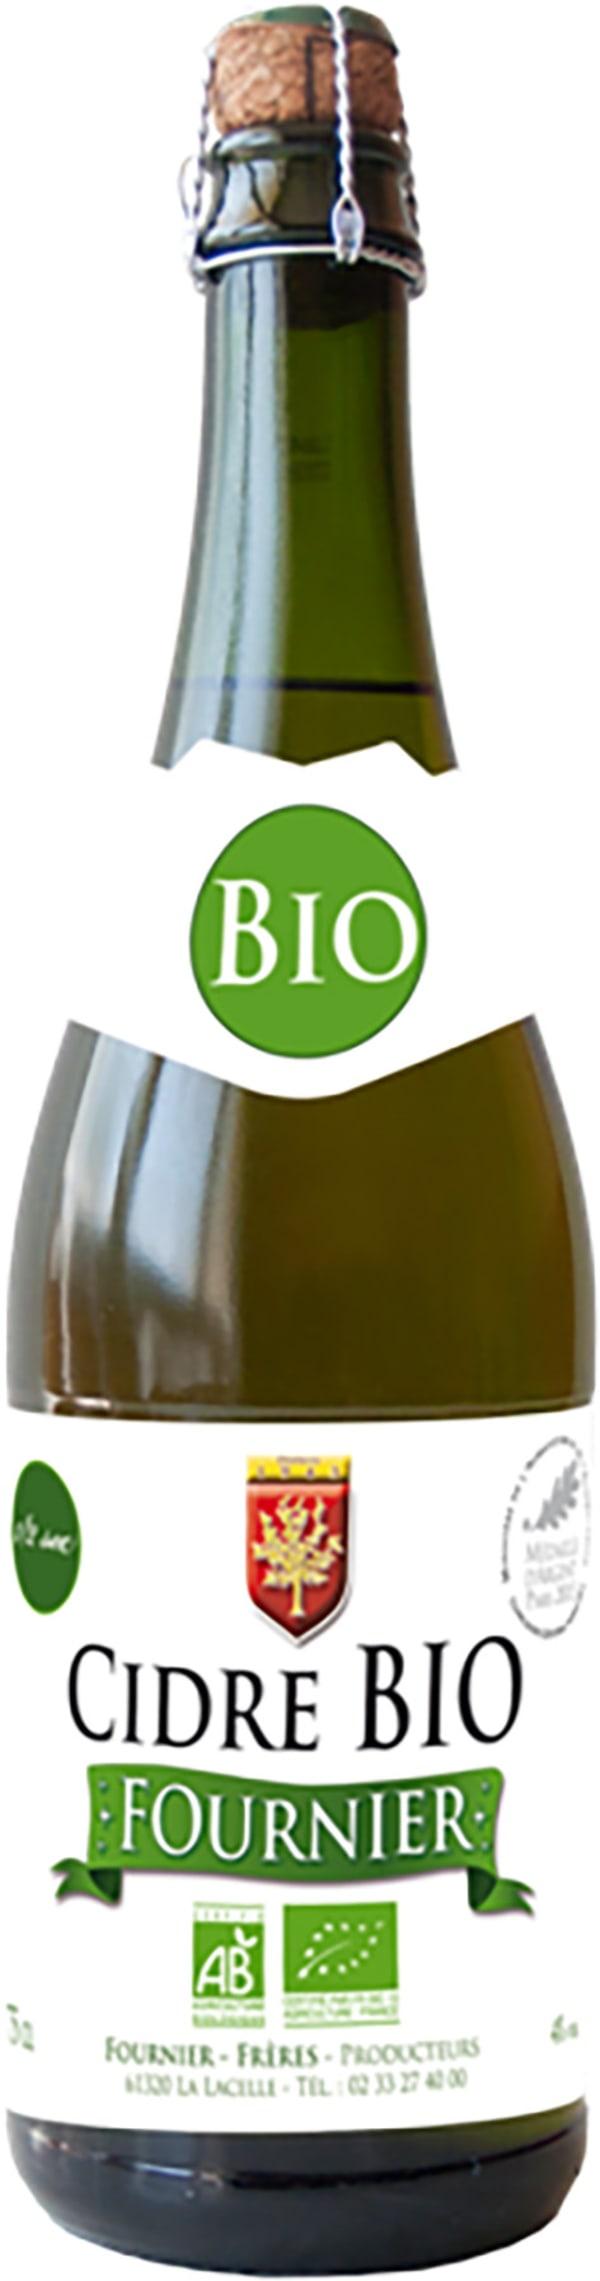 Fournier Cidre Bio